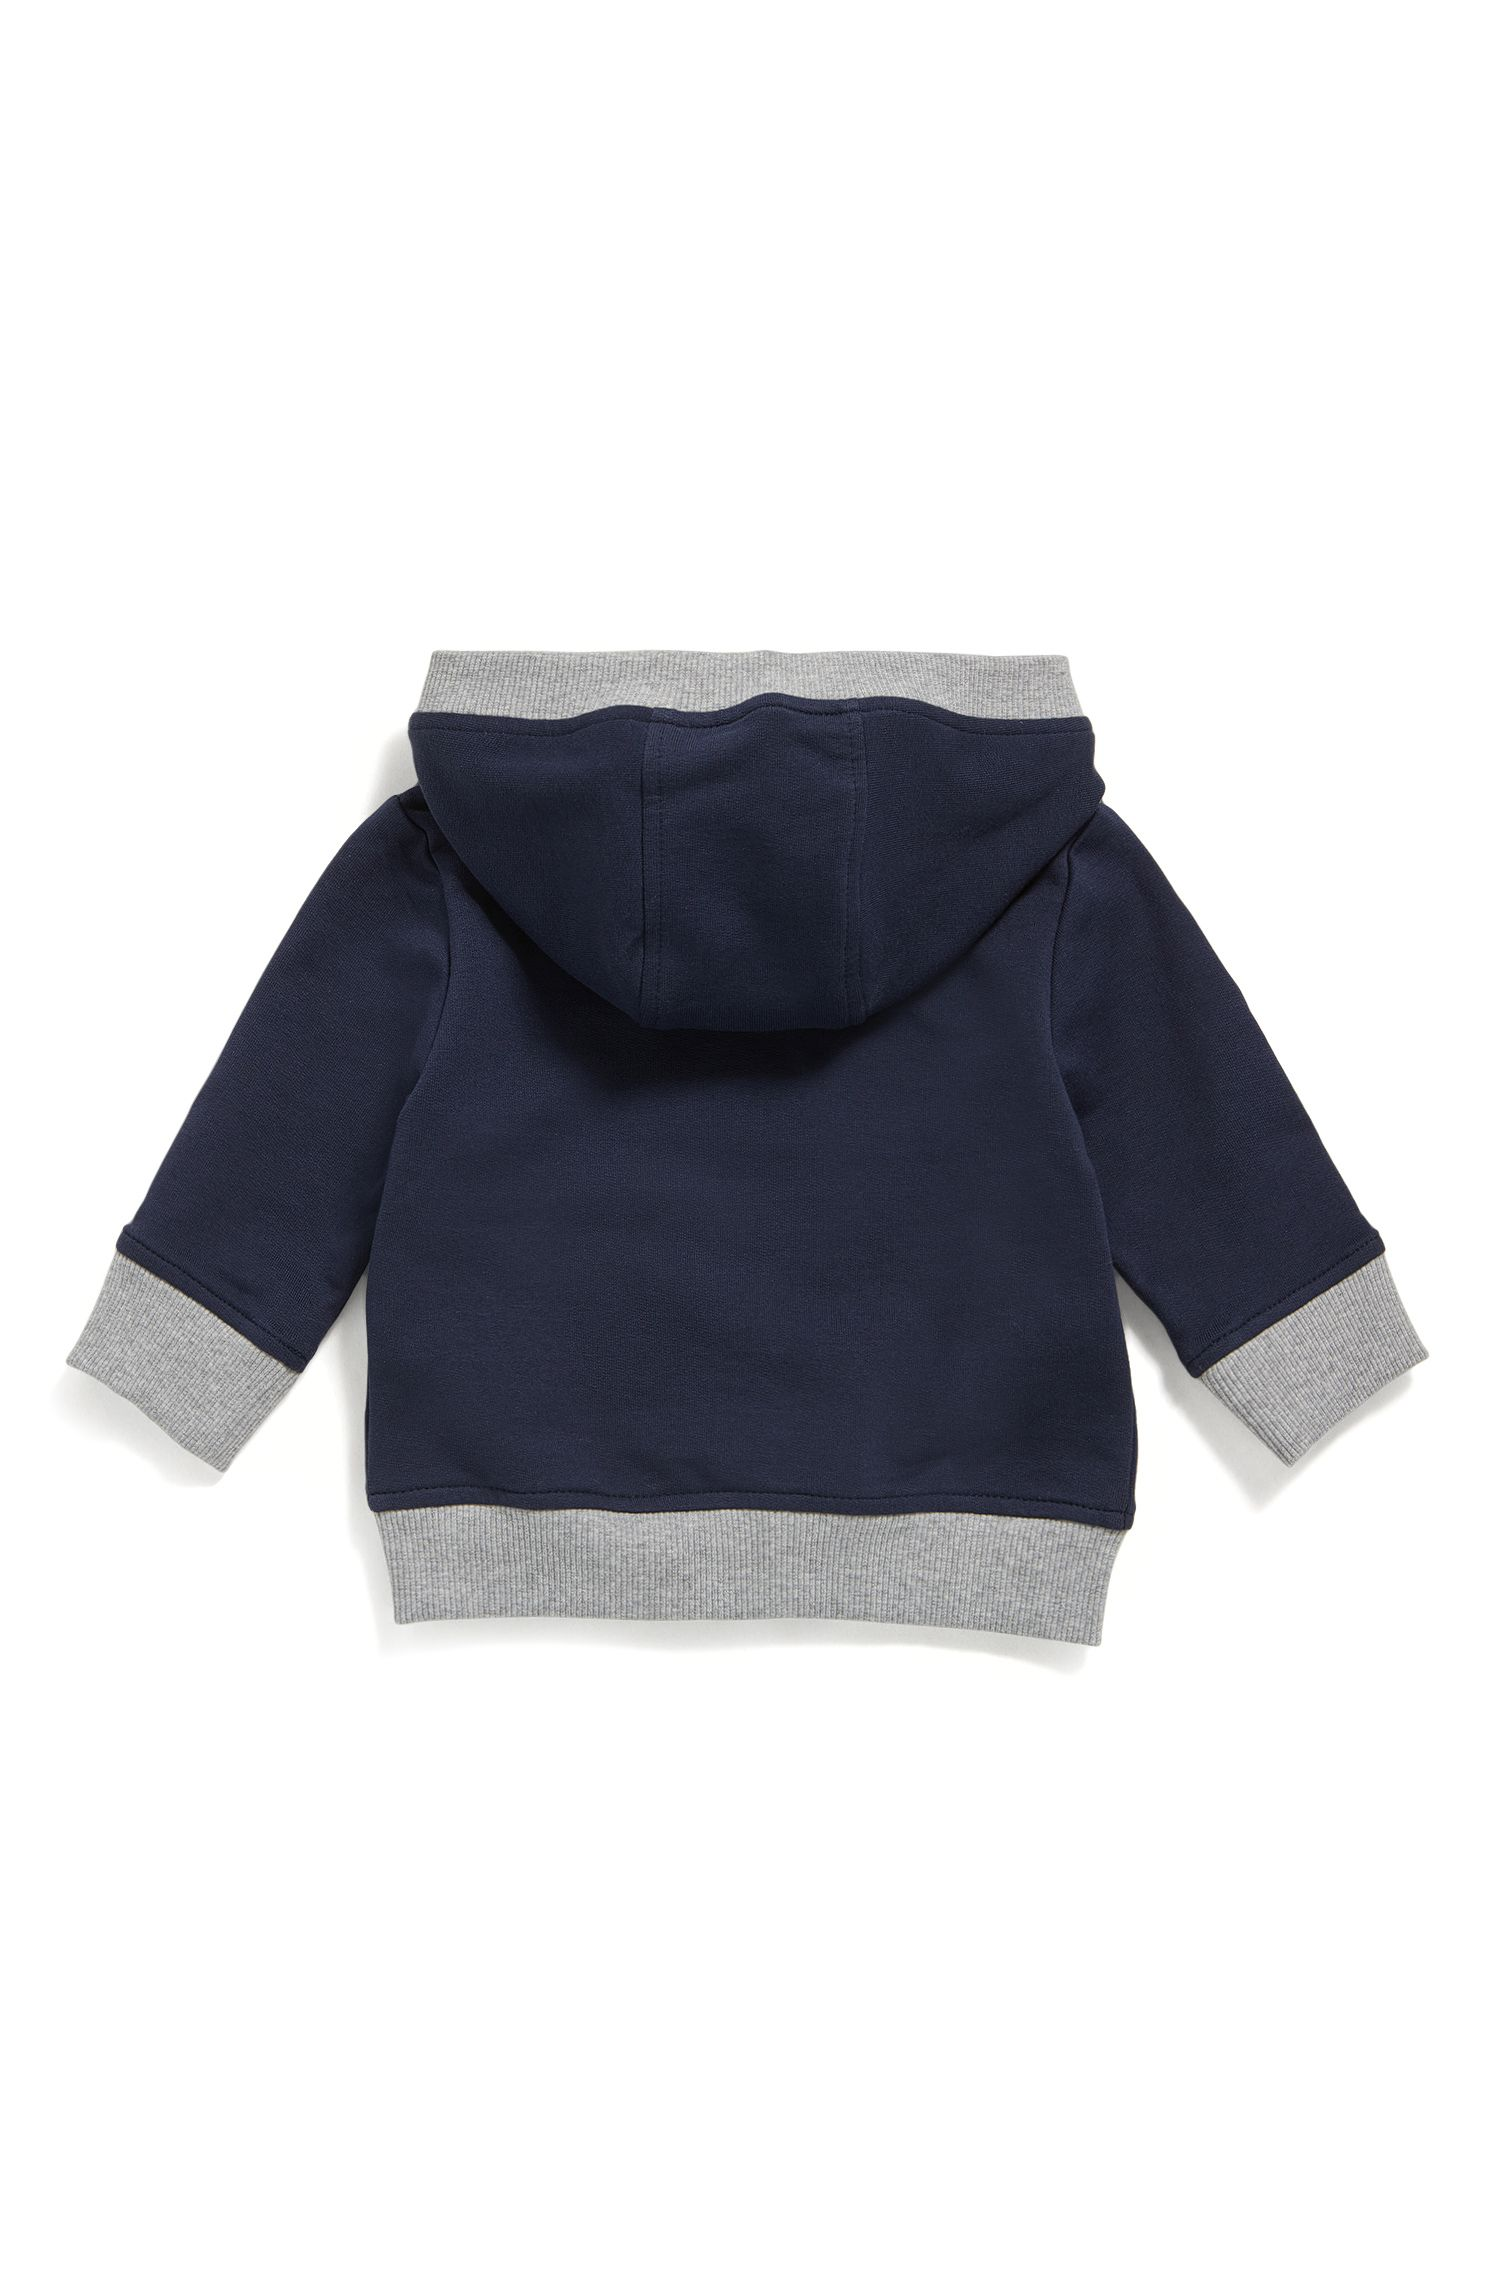 Kids-Kapuzenjacke aus Stretch-Baumwolle, Dunkelblau